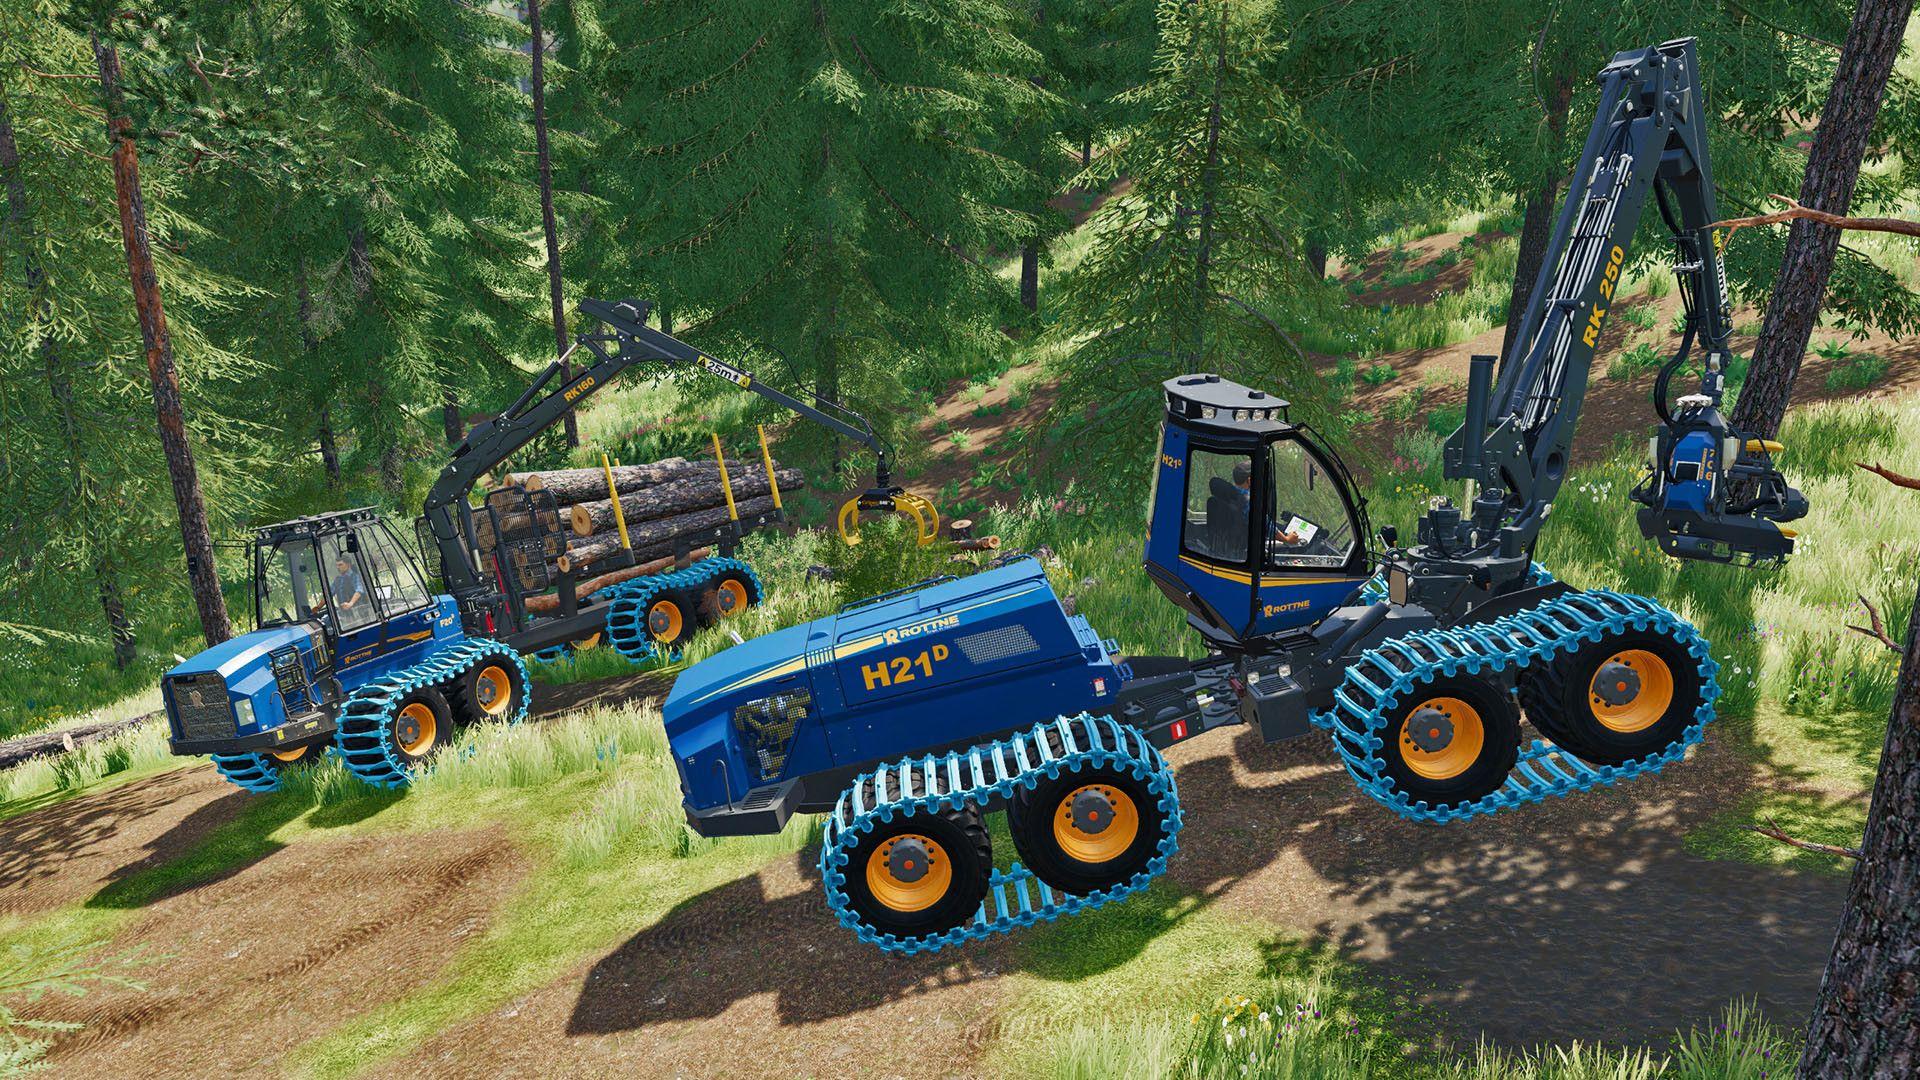 FARMING19ROTTNE2.jpg